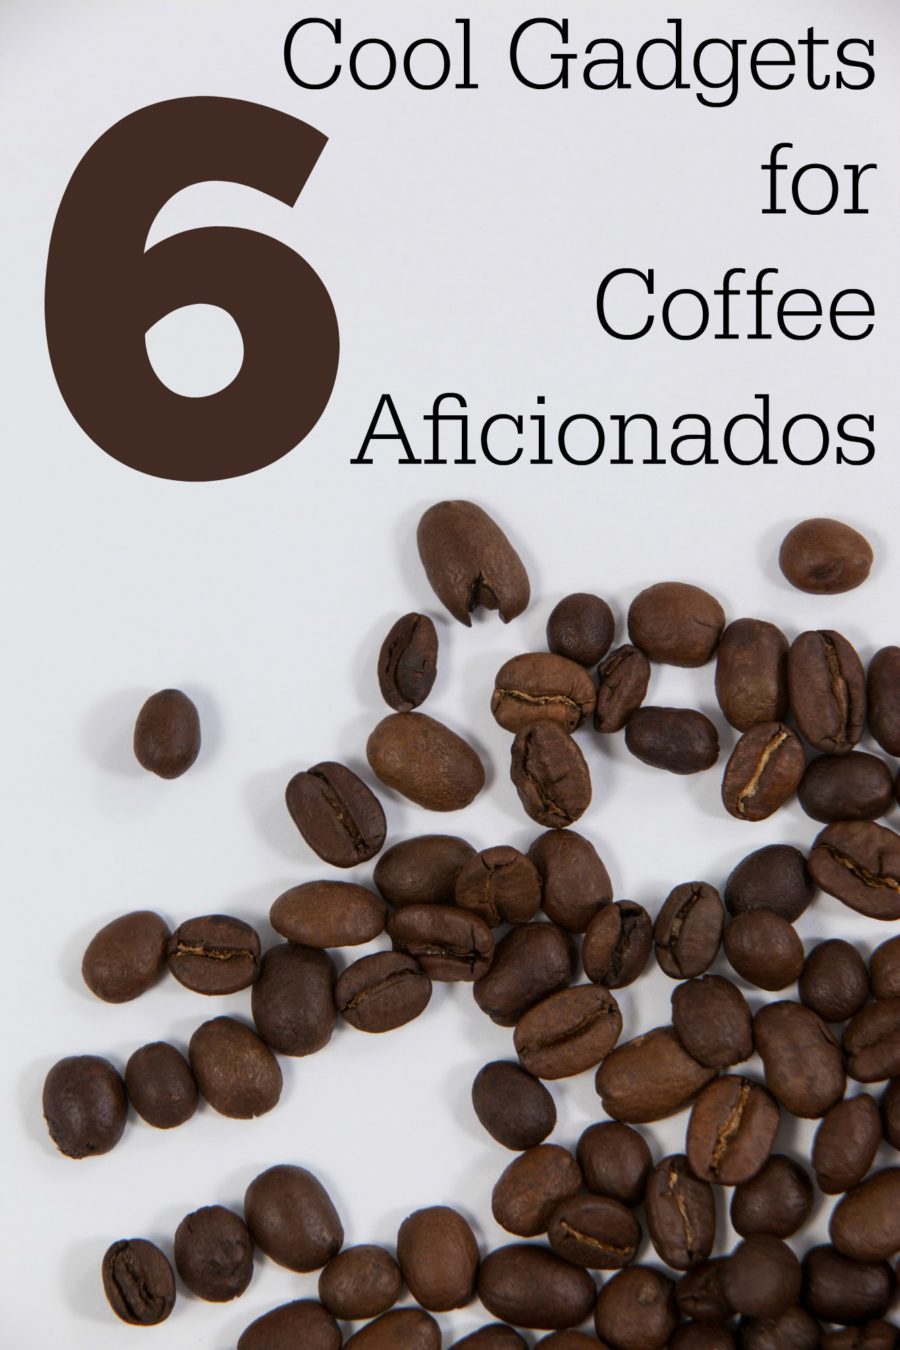 Cool Gifts for Coffee Aficionados